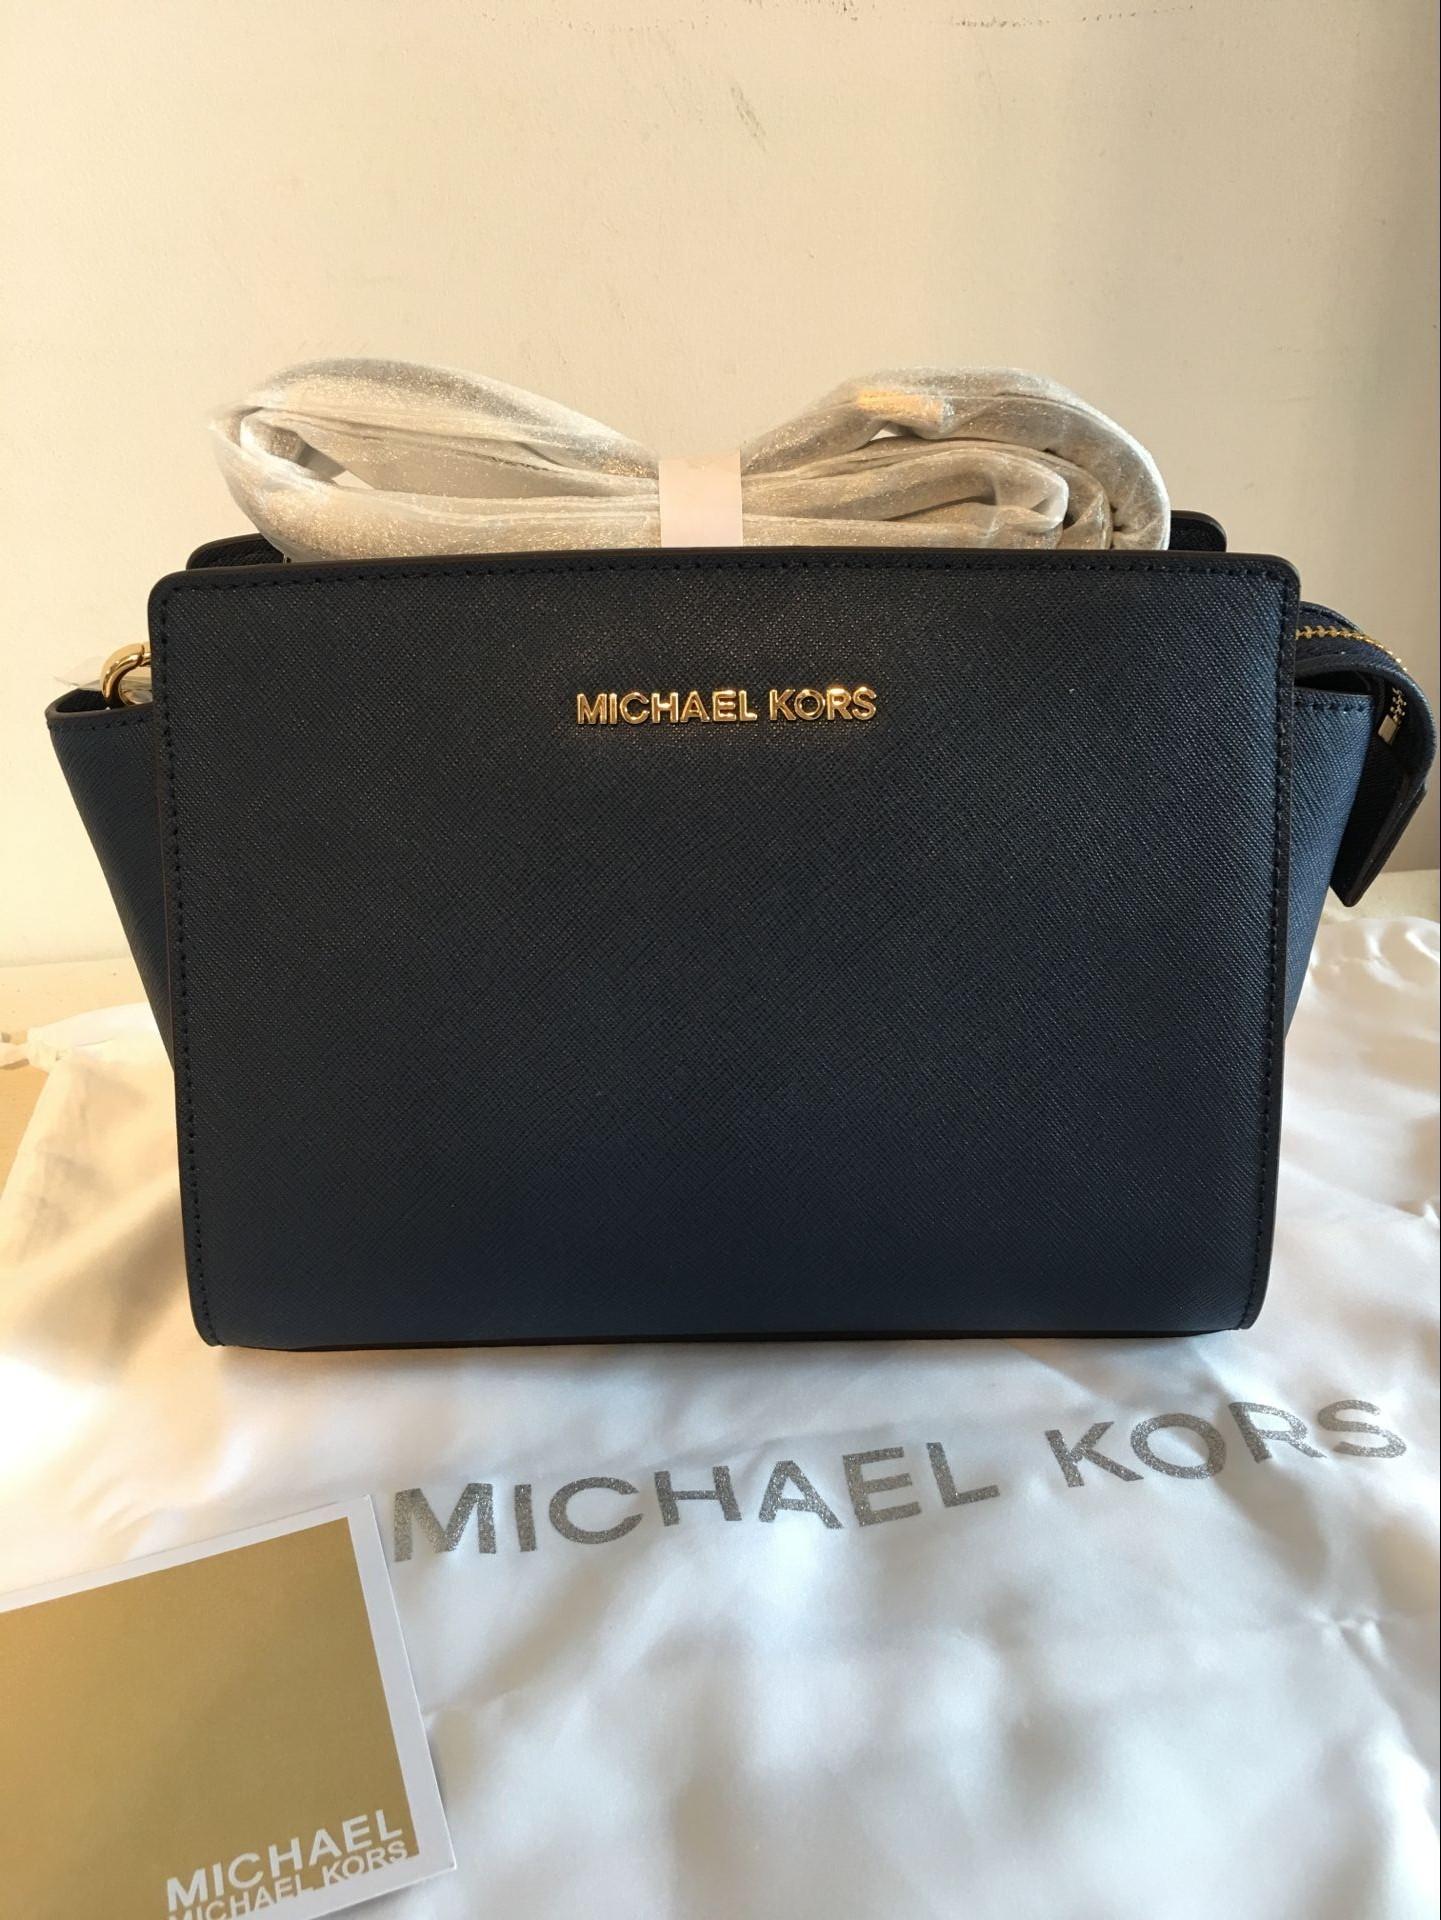 3fd725fce7fa MICHAEL KORS Selma Medium Messenger Crossbody Bag Navy Blue Authentic New  on Storenvy